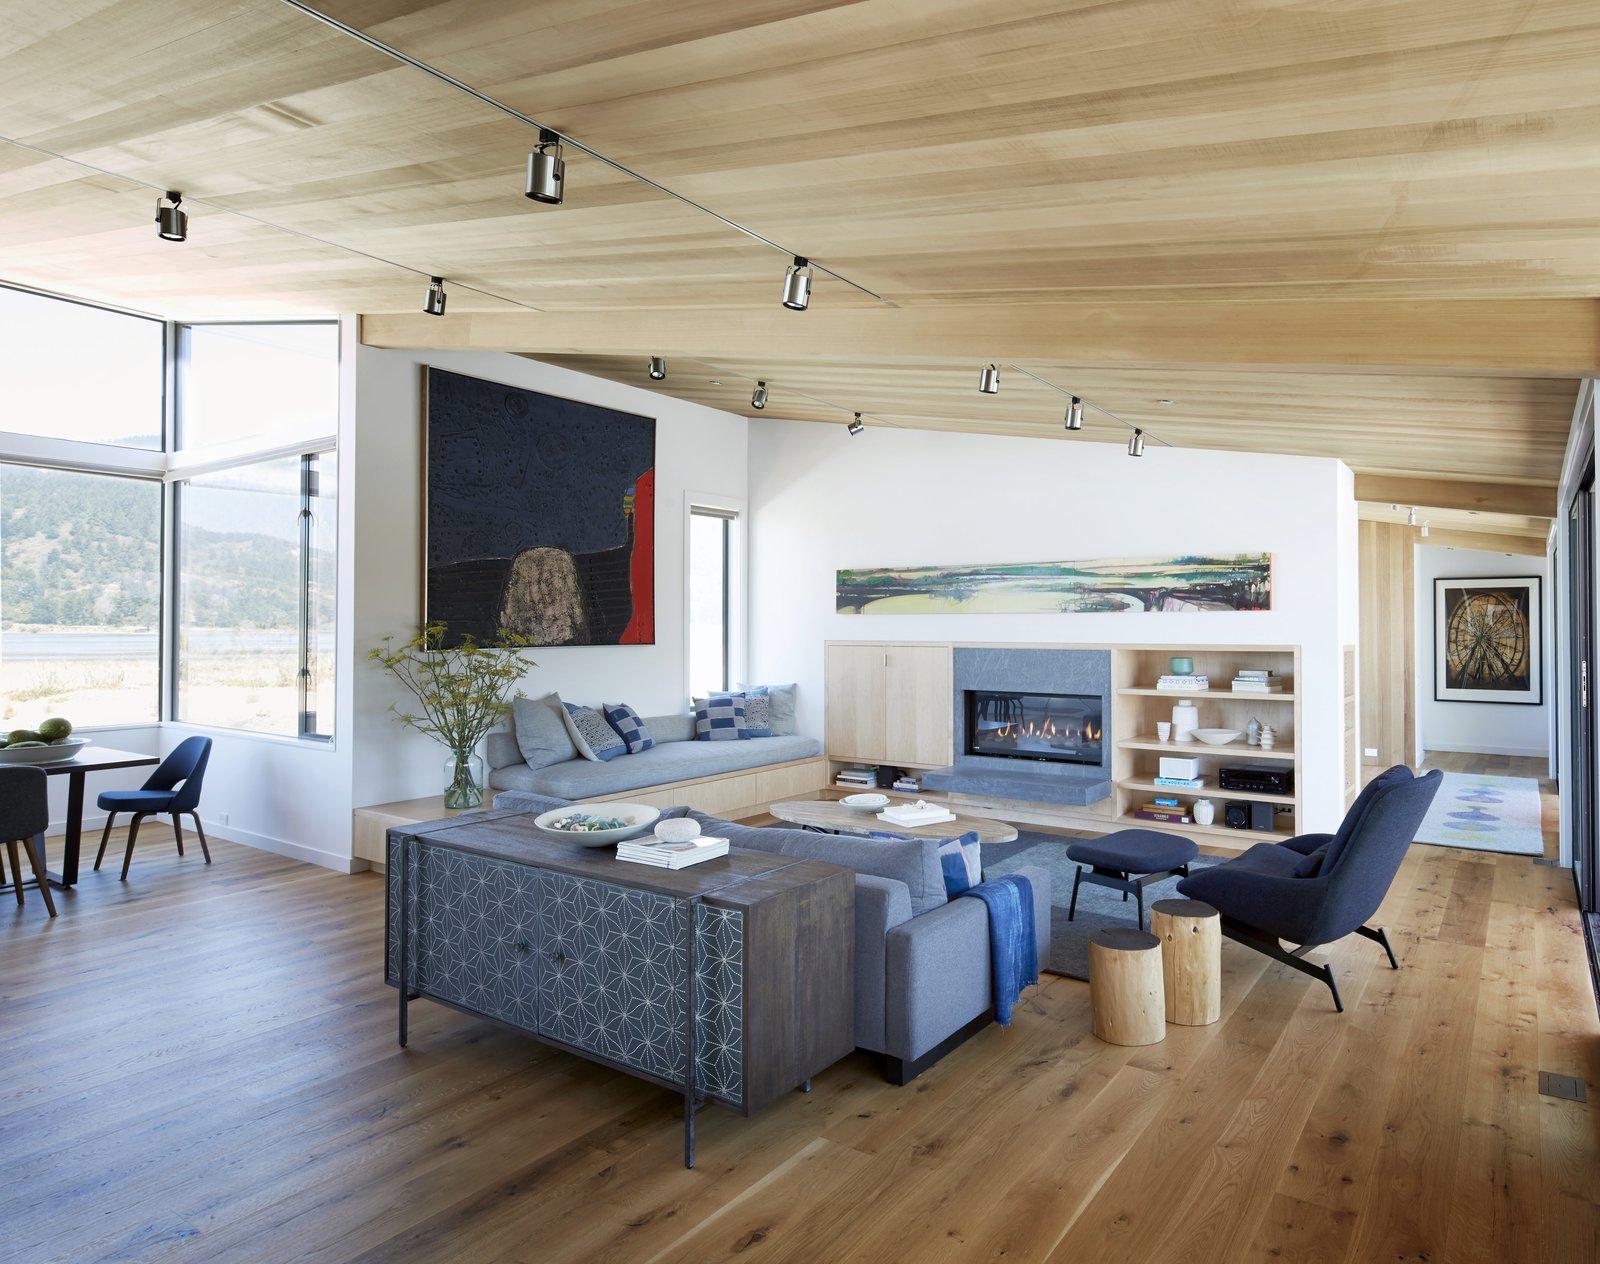 #TurnbullGriffinHaesloop #interior #livingroom #fireplace  Stinson Beach Lagoon Residence by Turnbull Griffin Haesloop Architects